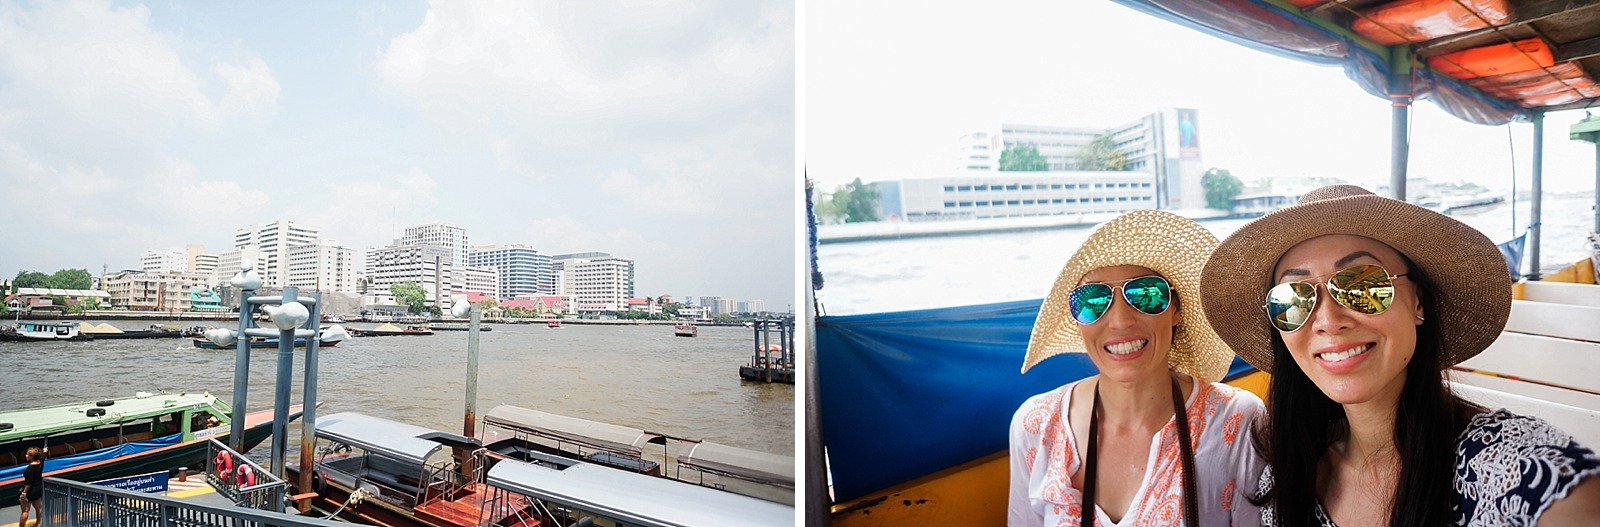 Thailand-diana-elizabeth-travel-blogger-phoenix-191